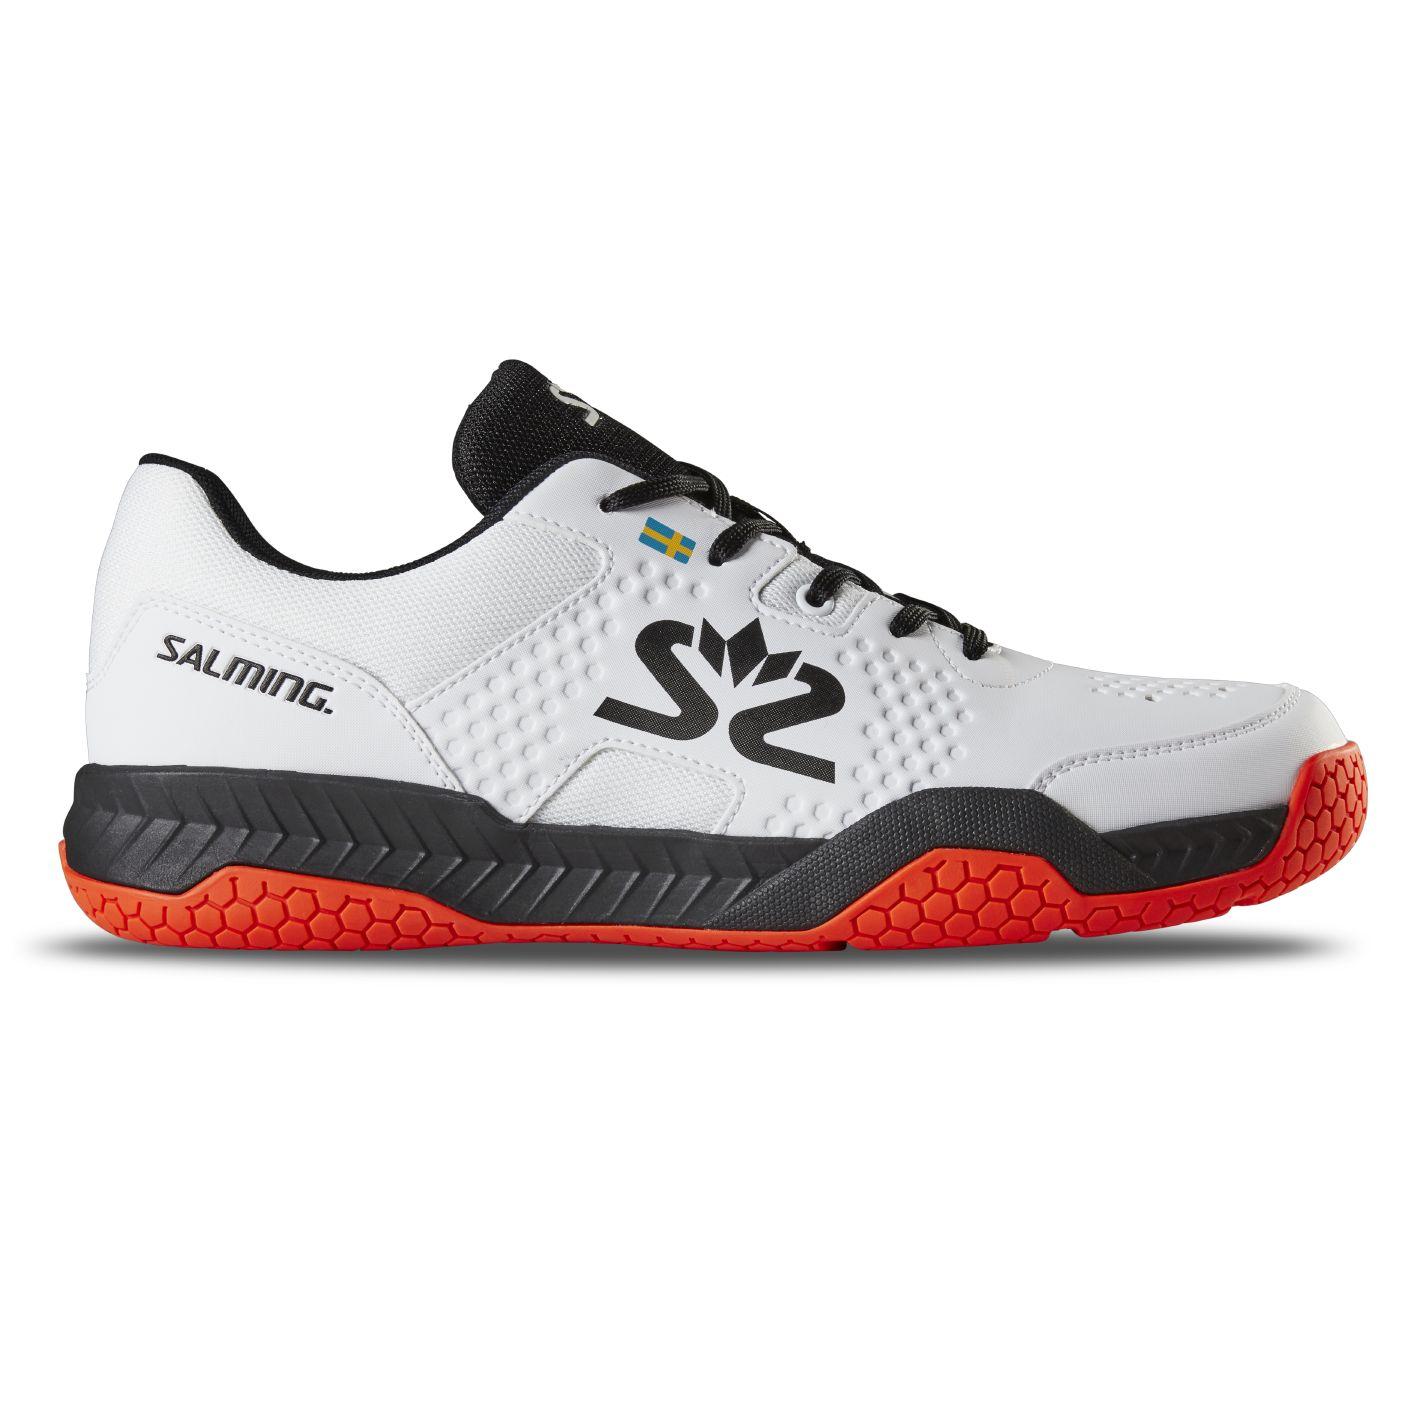 Salming Hawk Court Shoe Men White/Black 6,5 UK - 40 2/3 EUR - 25,5 cm